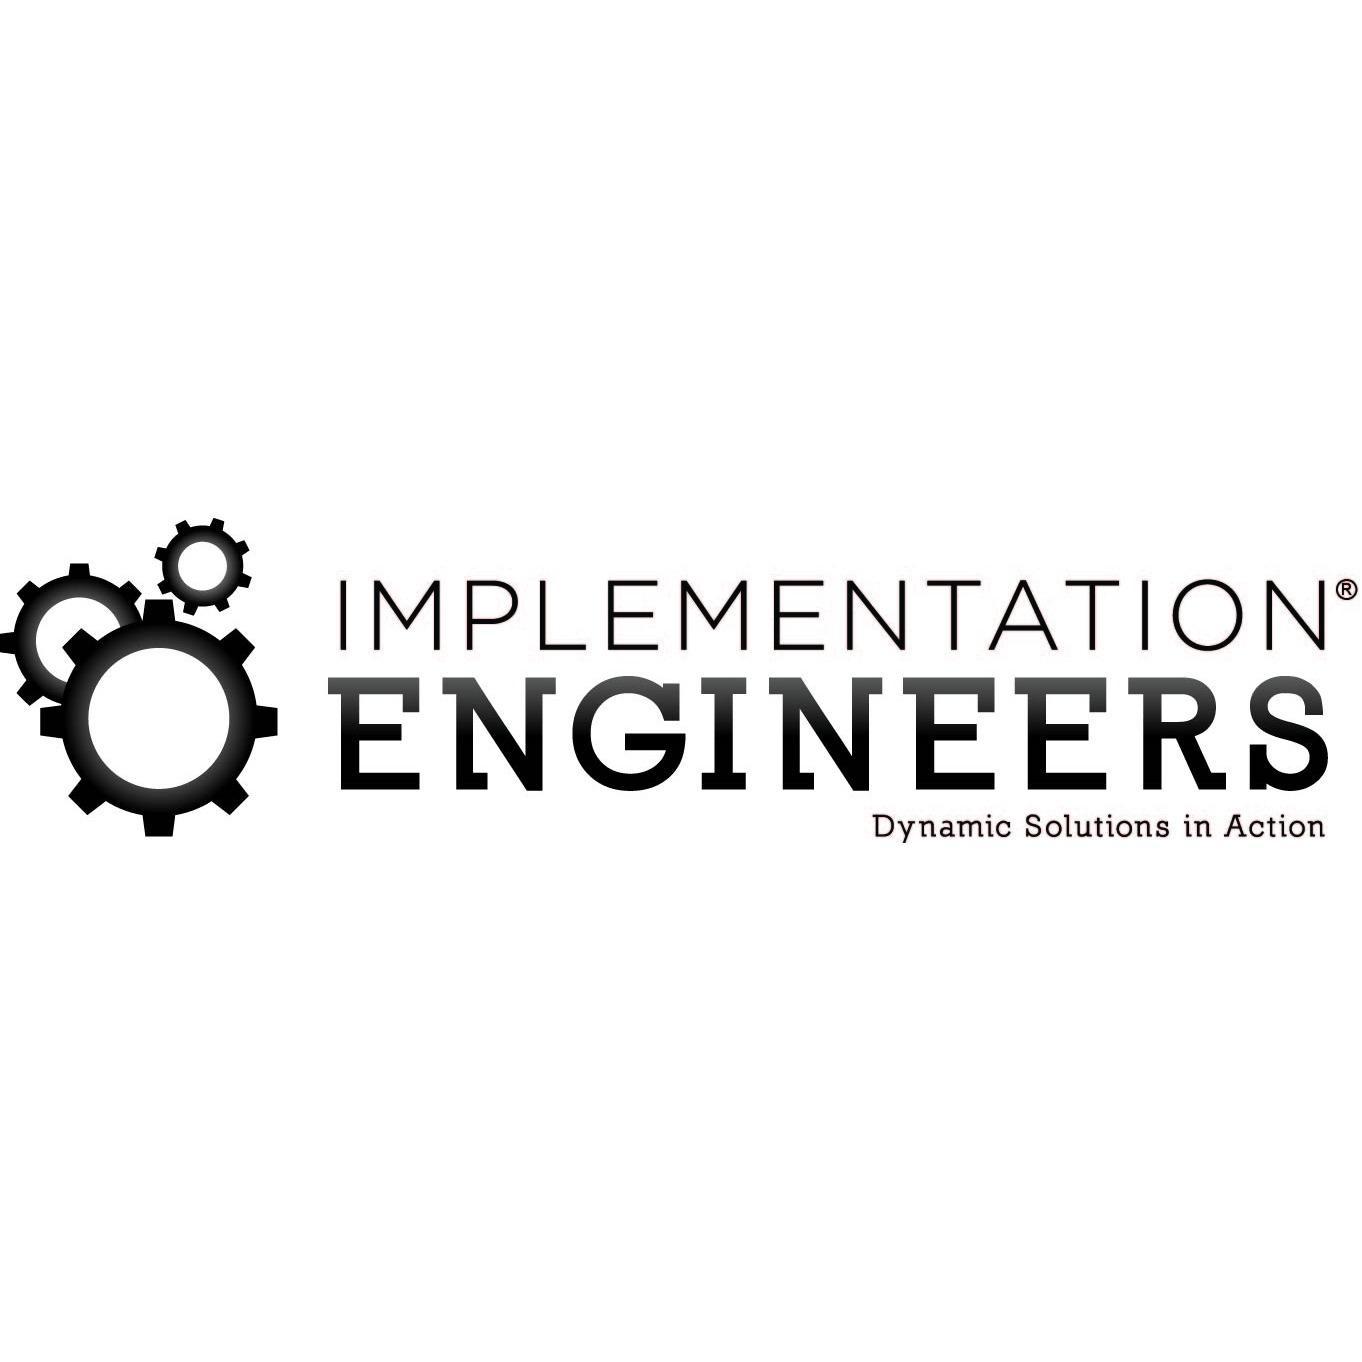 Implementation Engineers